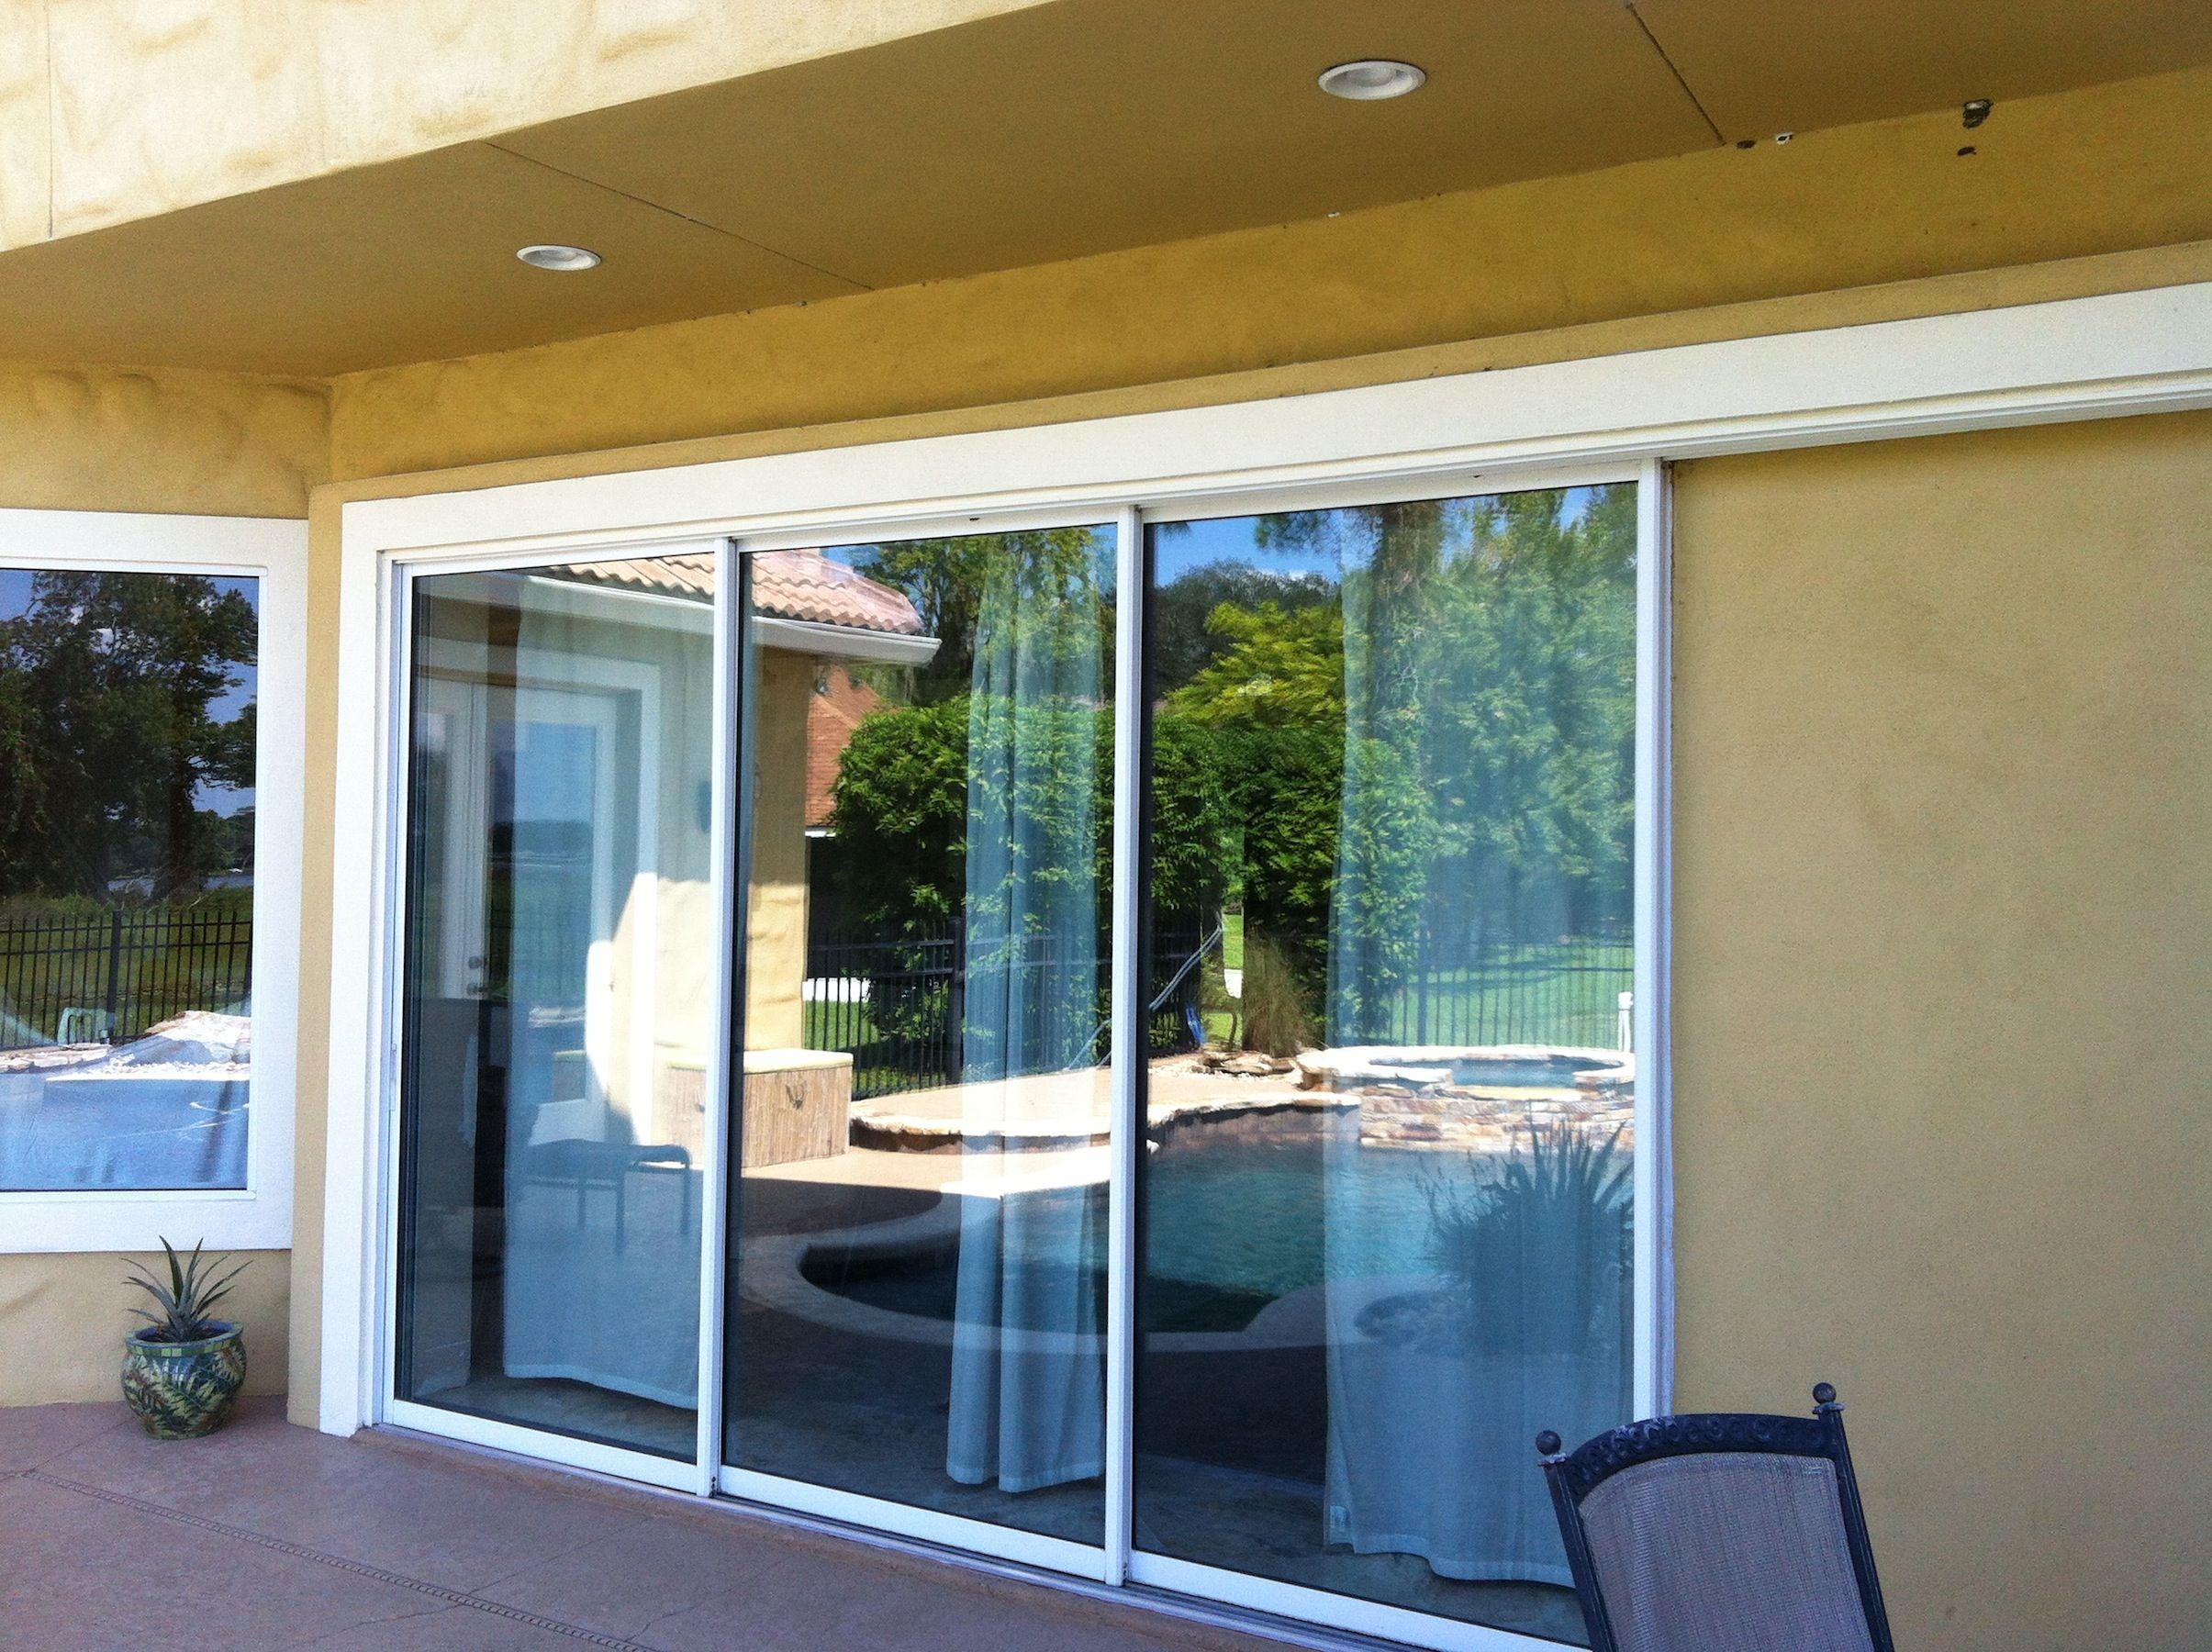 Sliding Glass Door Tint Luxury Doors Patio Within Elegant With Luxurious Style 1 Jpg 2410 1800